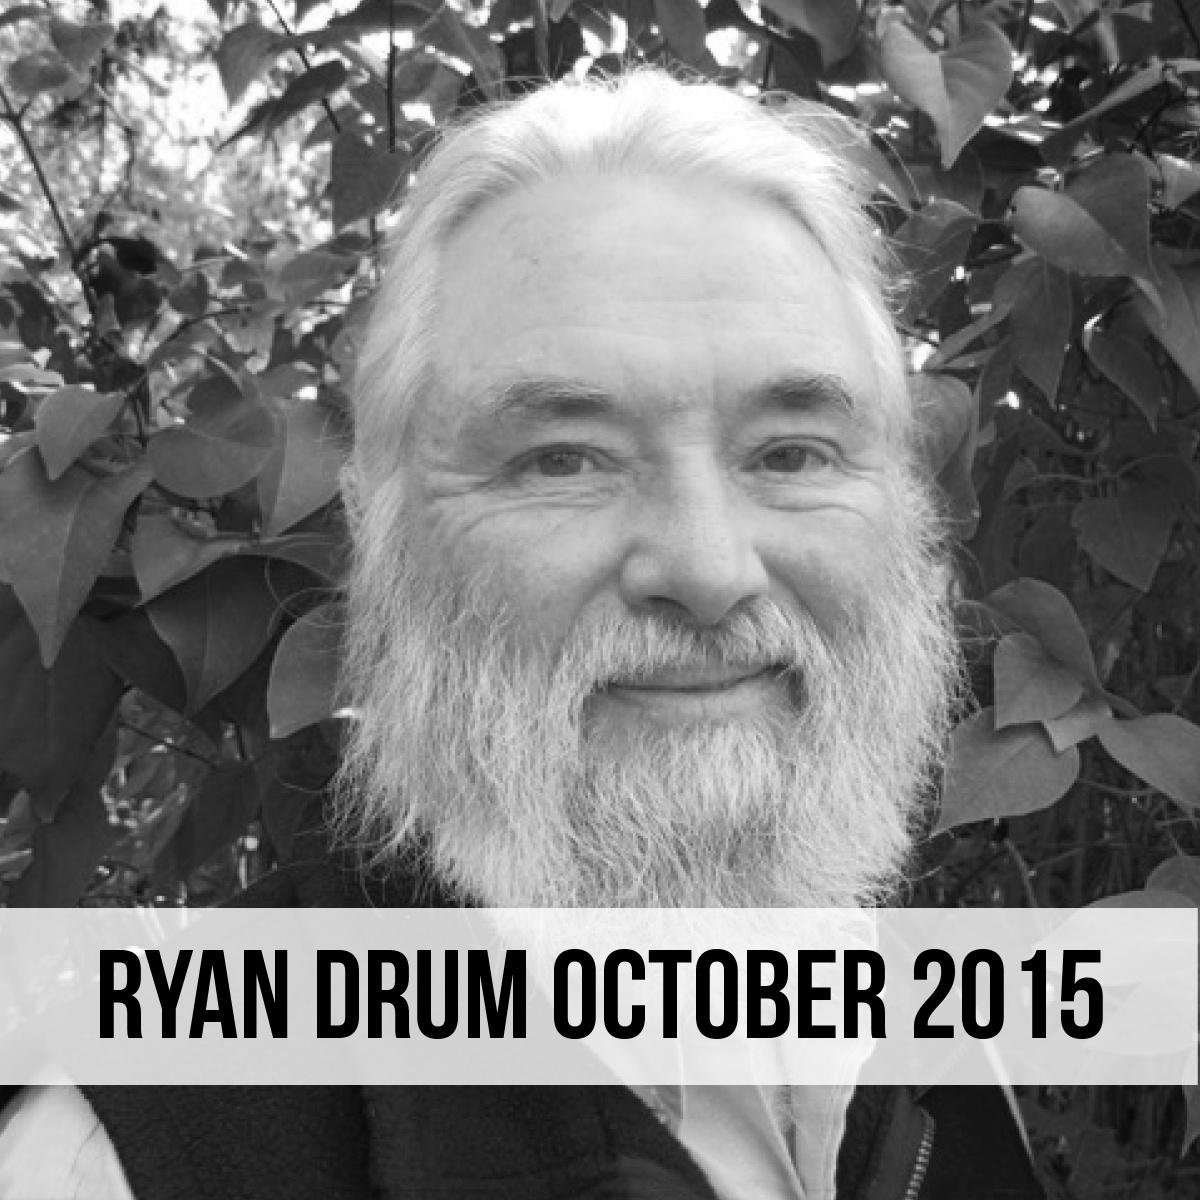 Ryan Drum